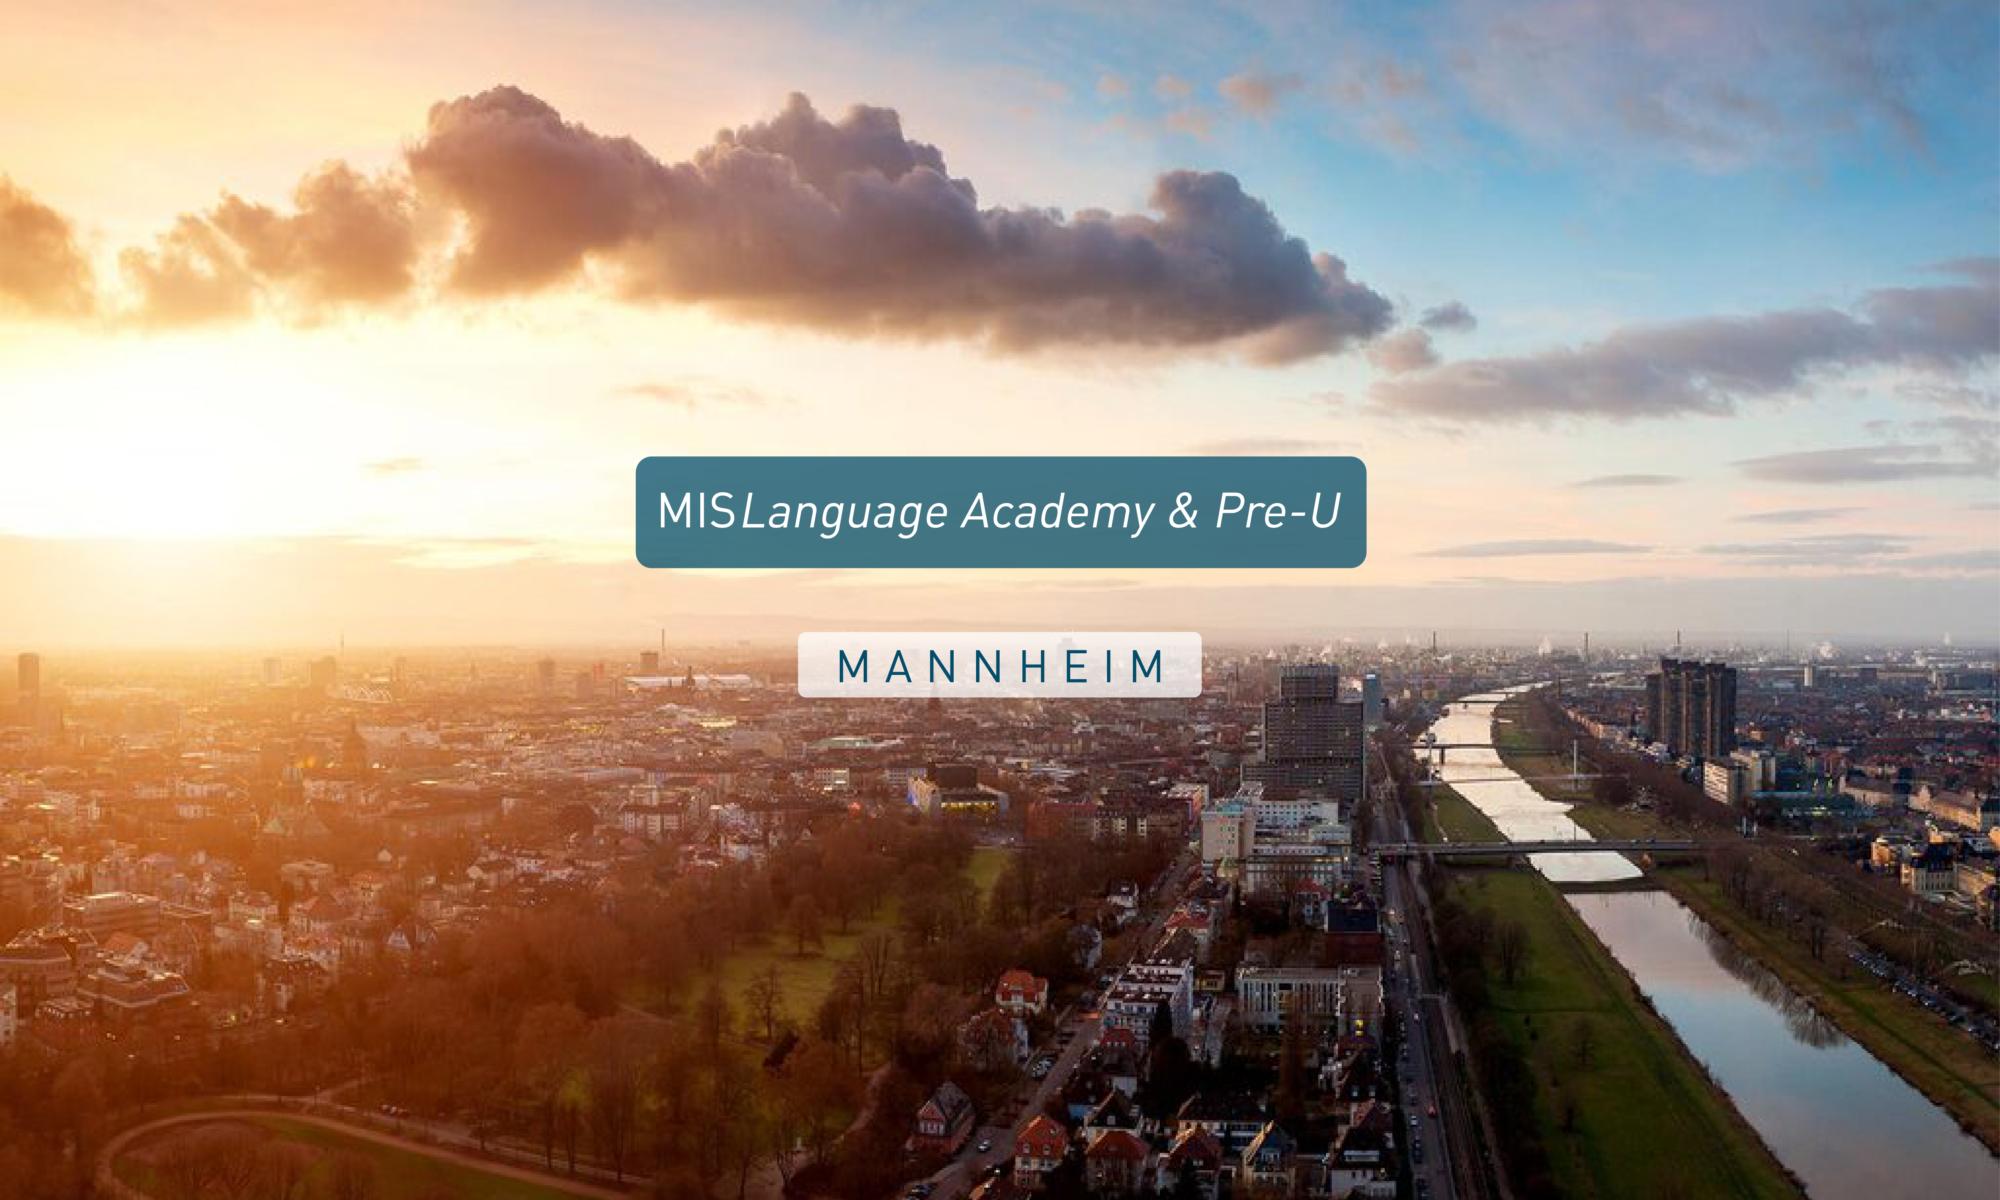 MISLanguage Academy and Pre-U